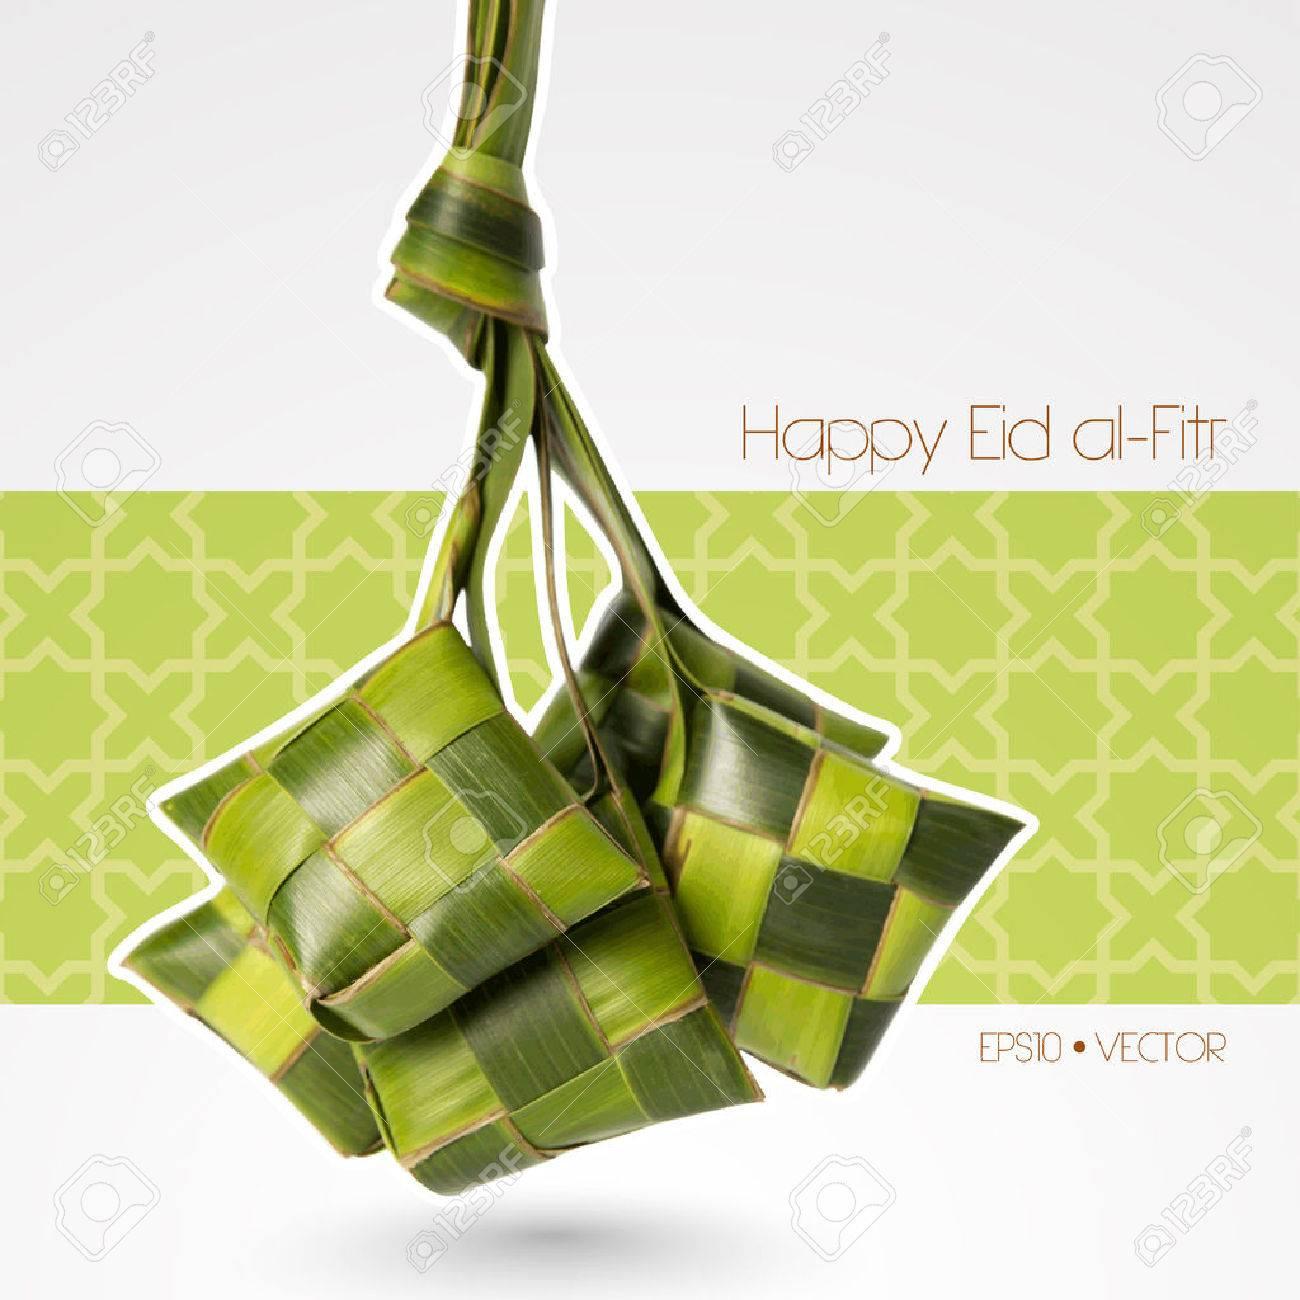 Most Inspiring Indonesia Eid Al-Fitr Feast - 29897489-vector-muslim-ketupat-rice-dumpling-translation-happy-eid-al-fitr-feast-of-breaking-the-fast  Collection_366936 .jpg